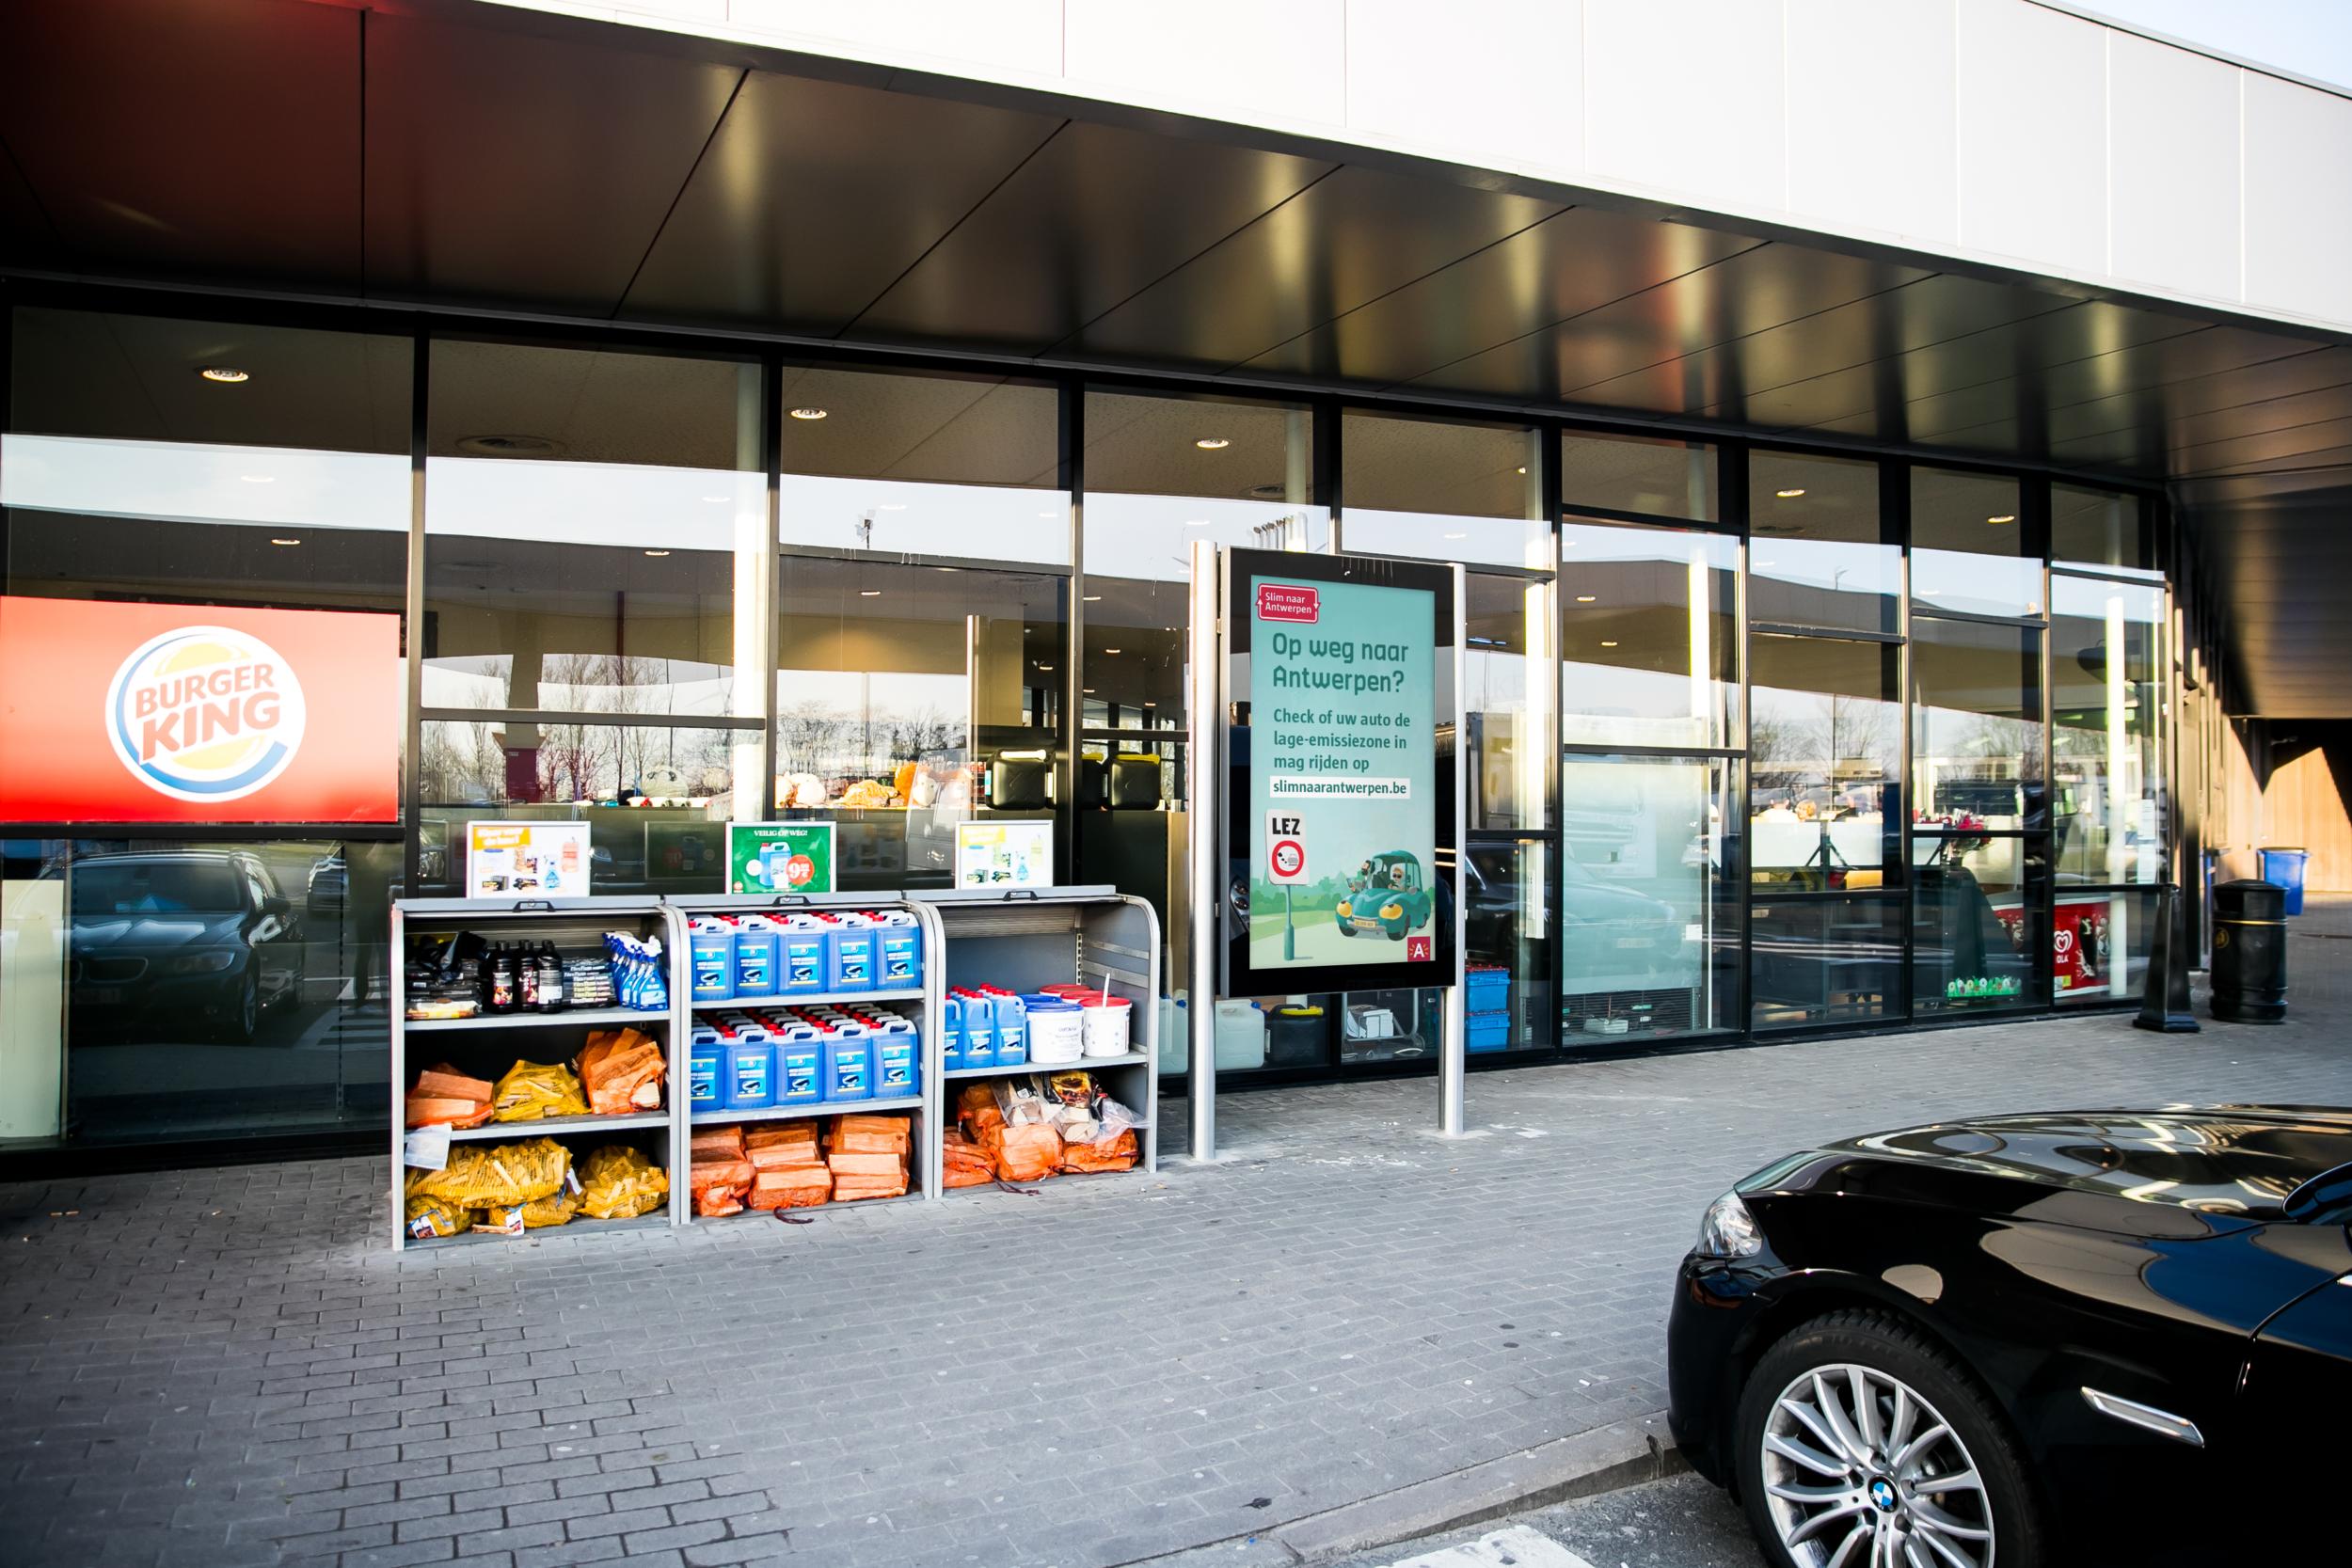 Esso 75 Minderhout_StadAntwerpen.png